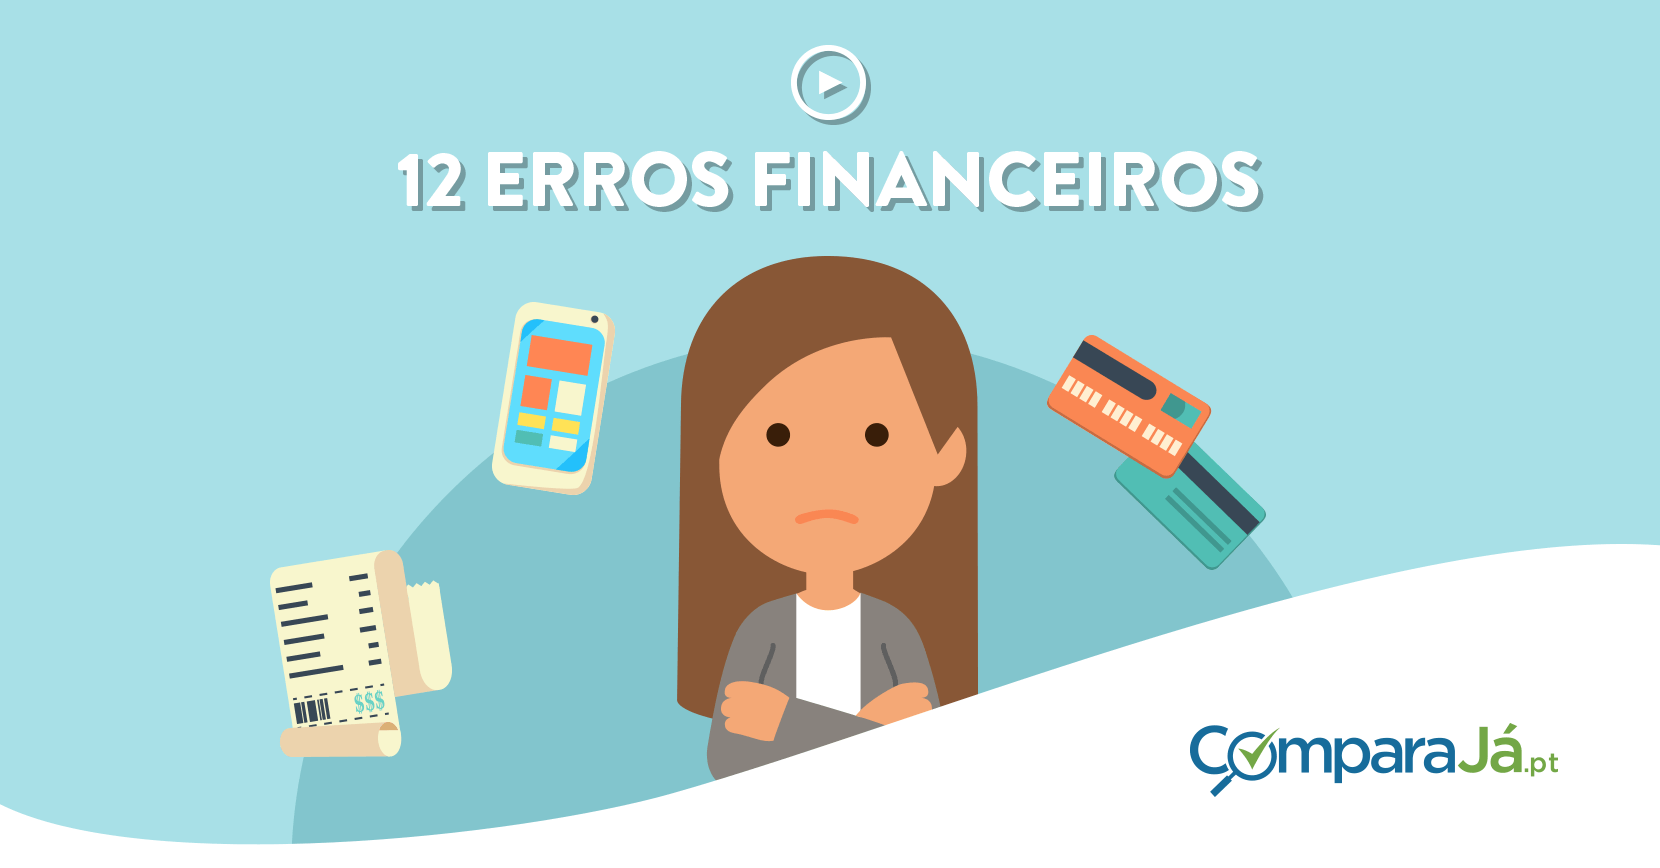 12 Meses, 12 Erros Financeiros